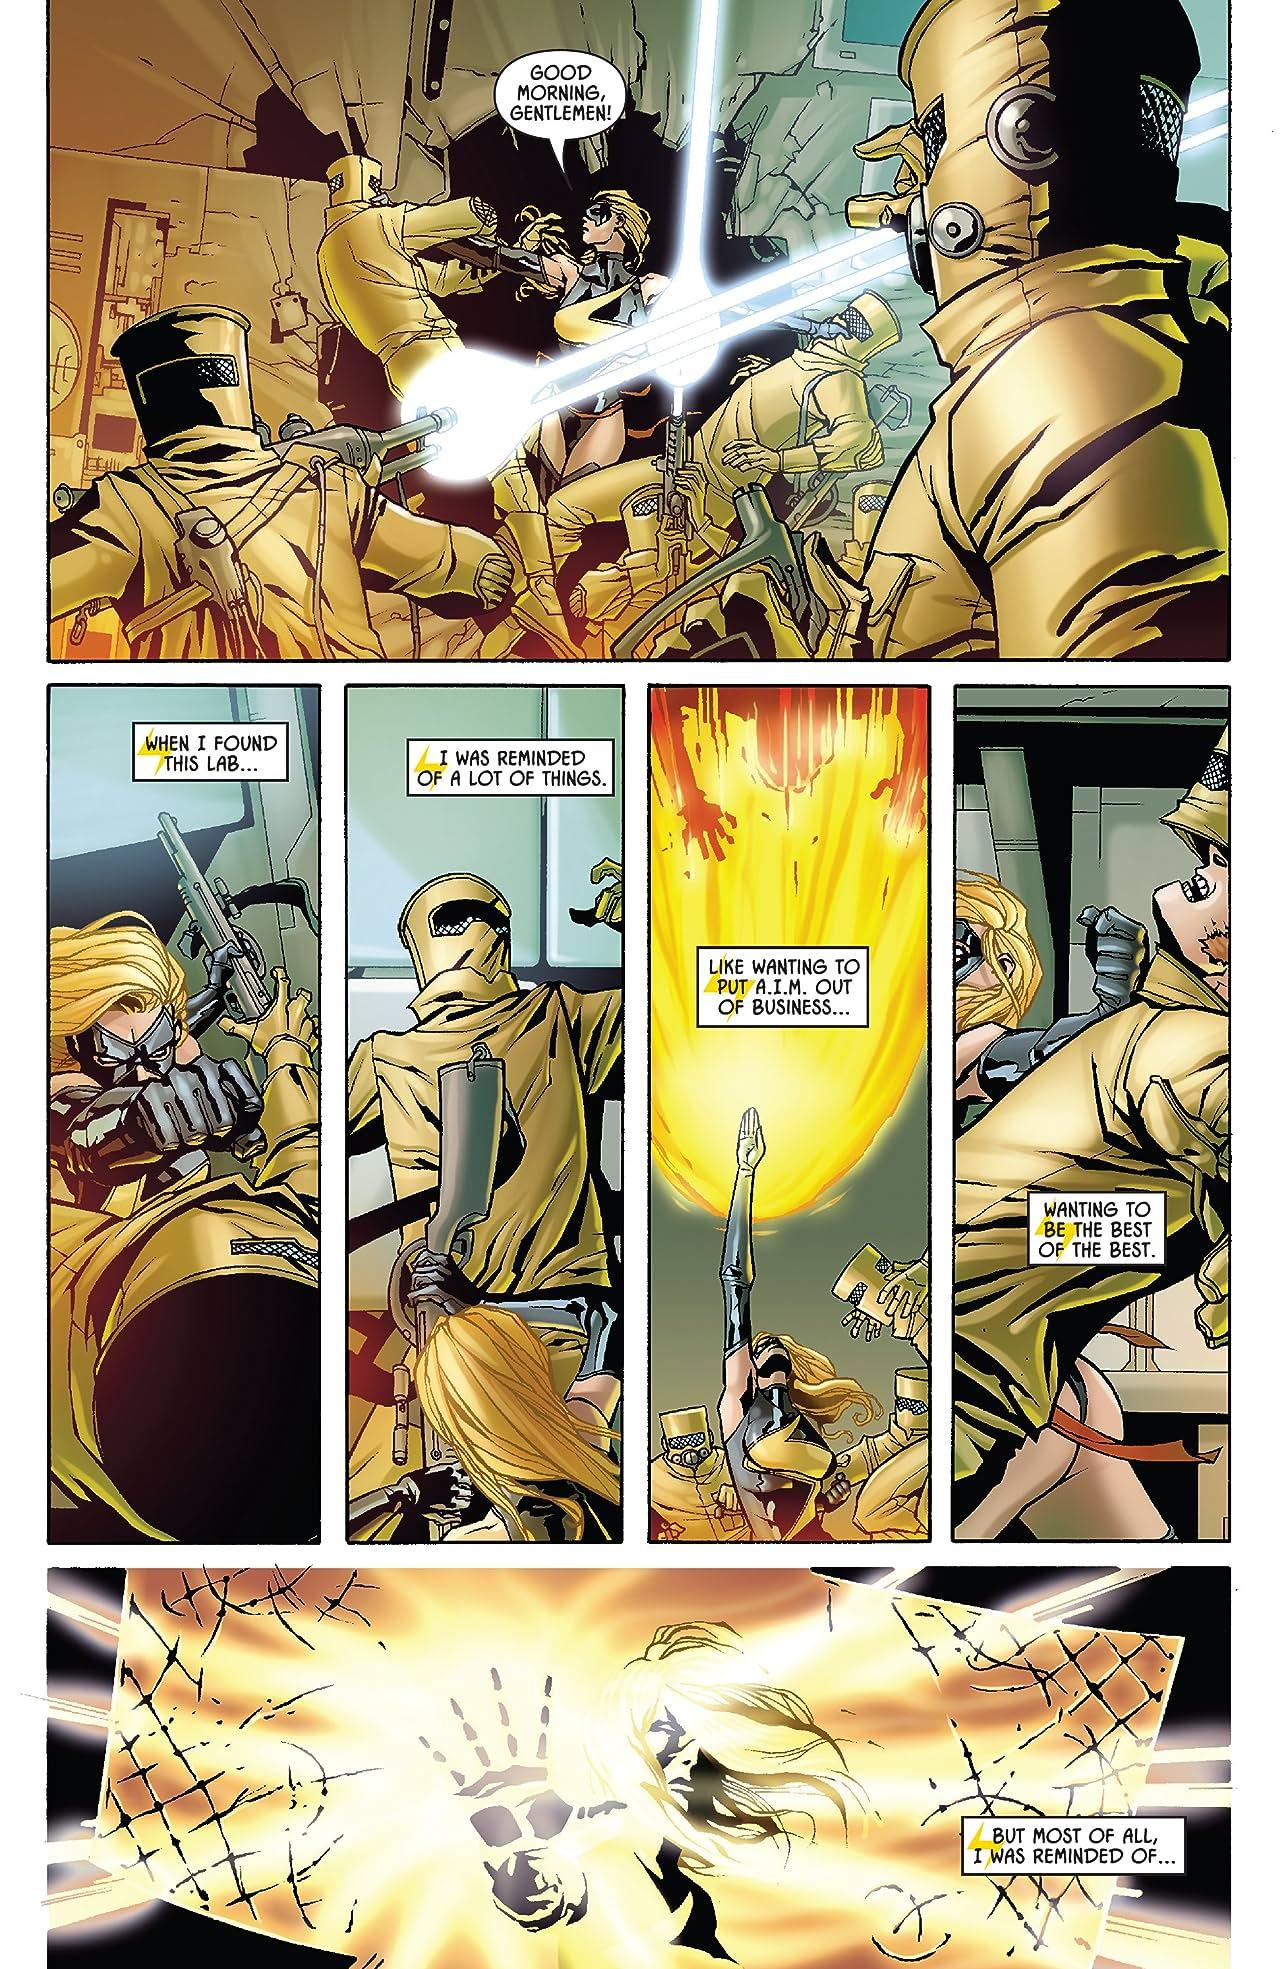 Captain Marvel: Carol Danvers – The Ms. Marvel Years Vol. 3